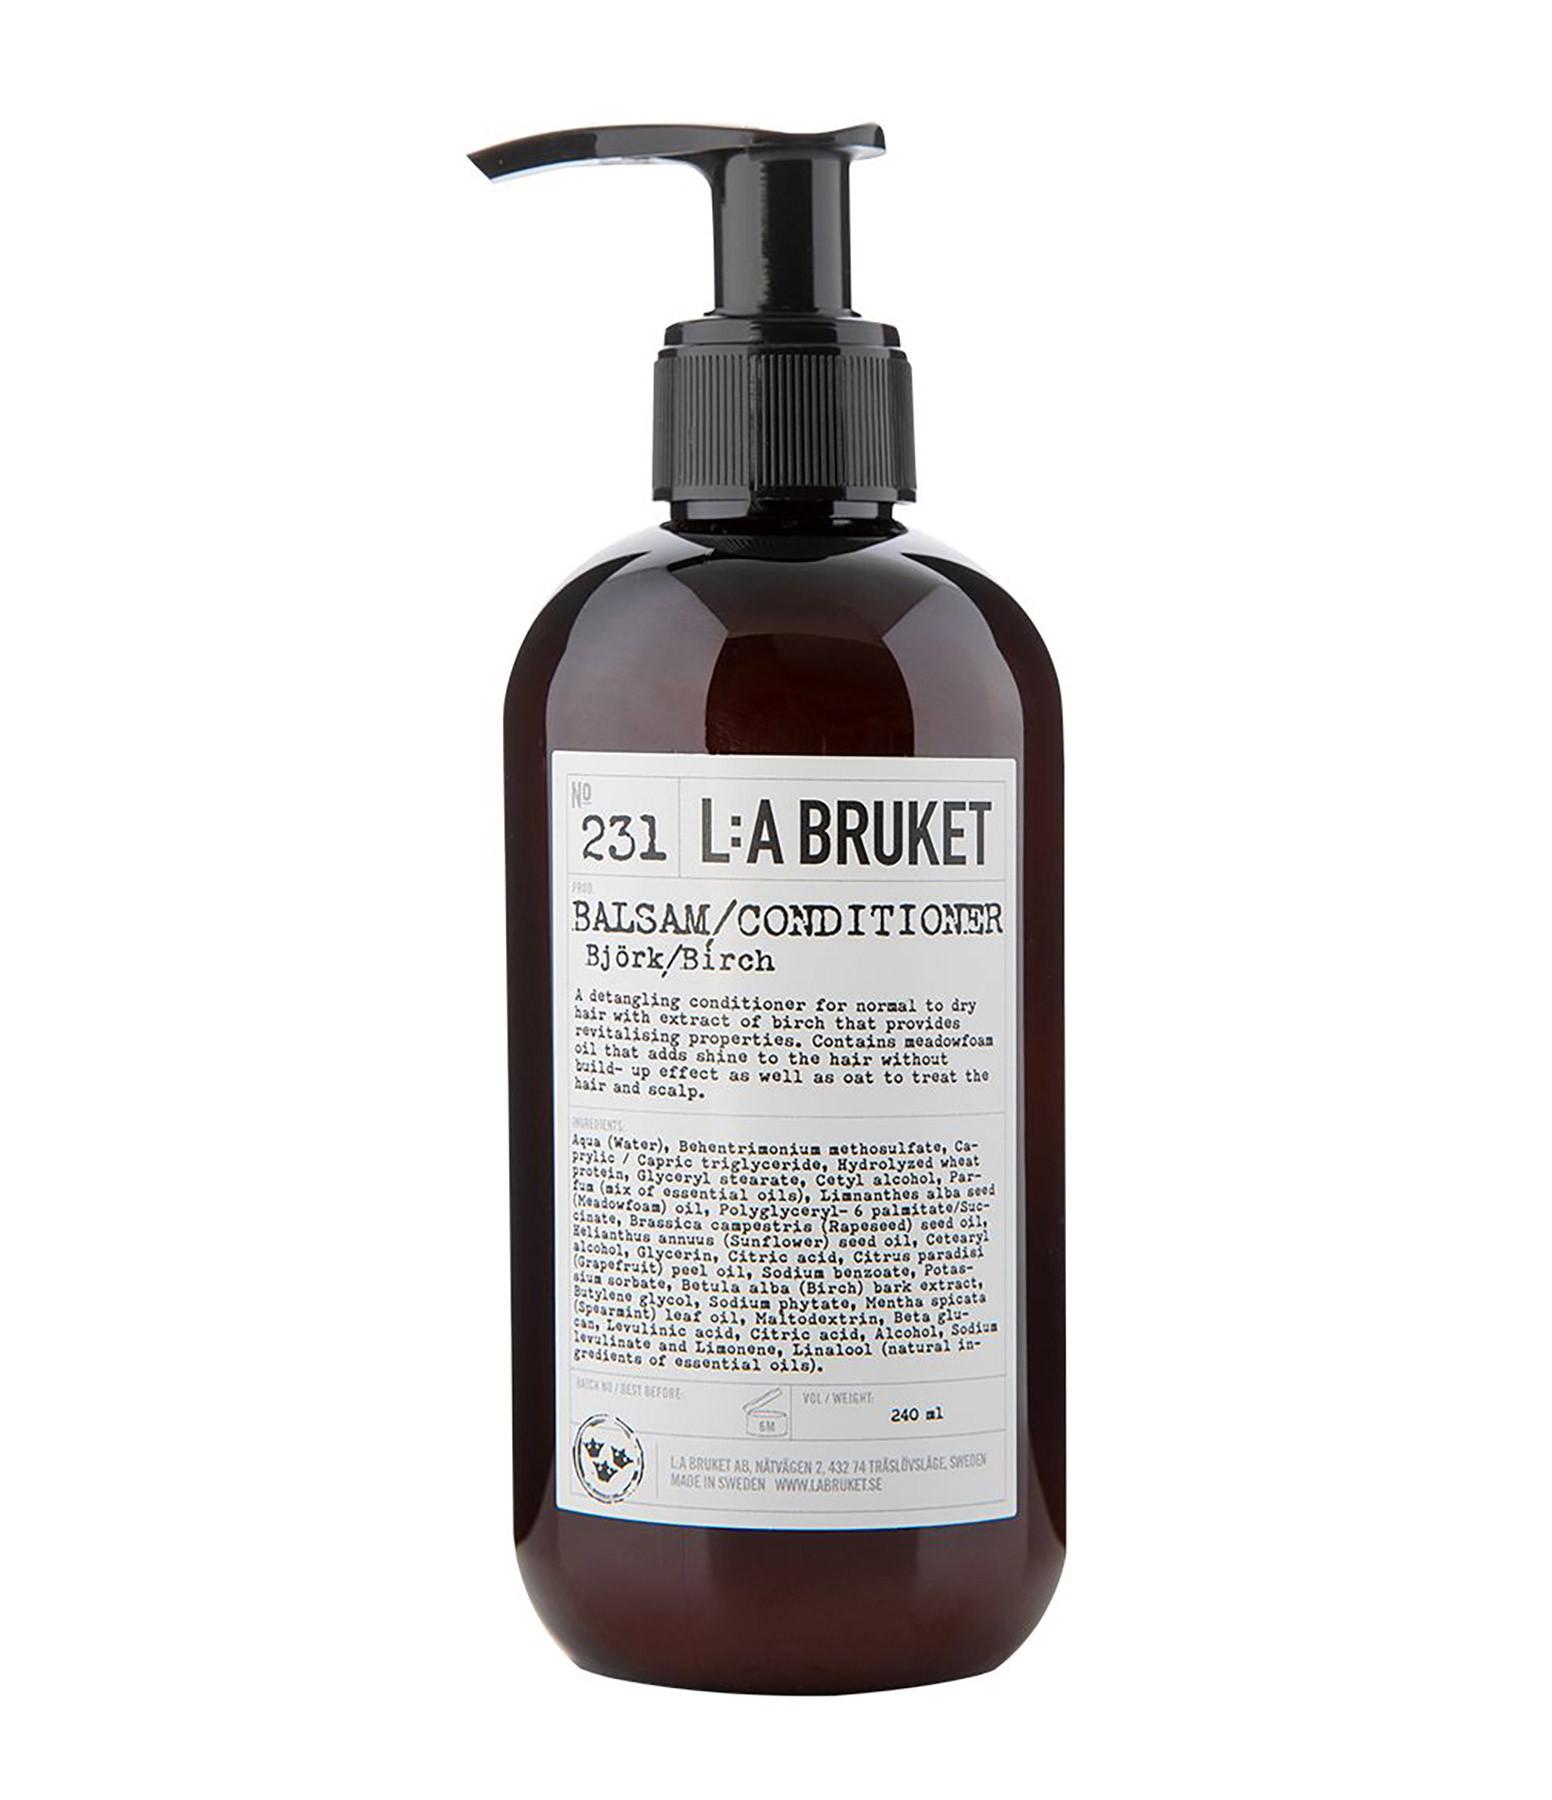 L:A BRUKET - Après-Shampoing Bouleau Aloe Vera 240 ml N°231